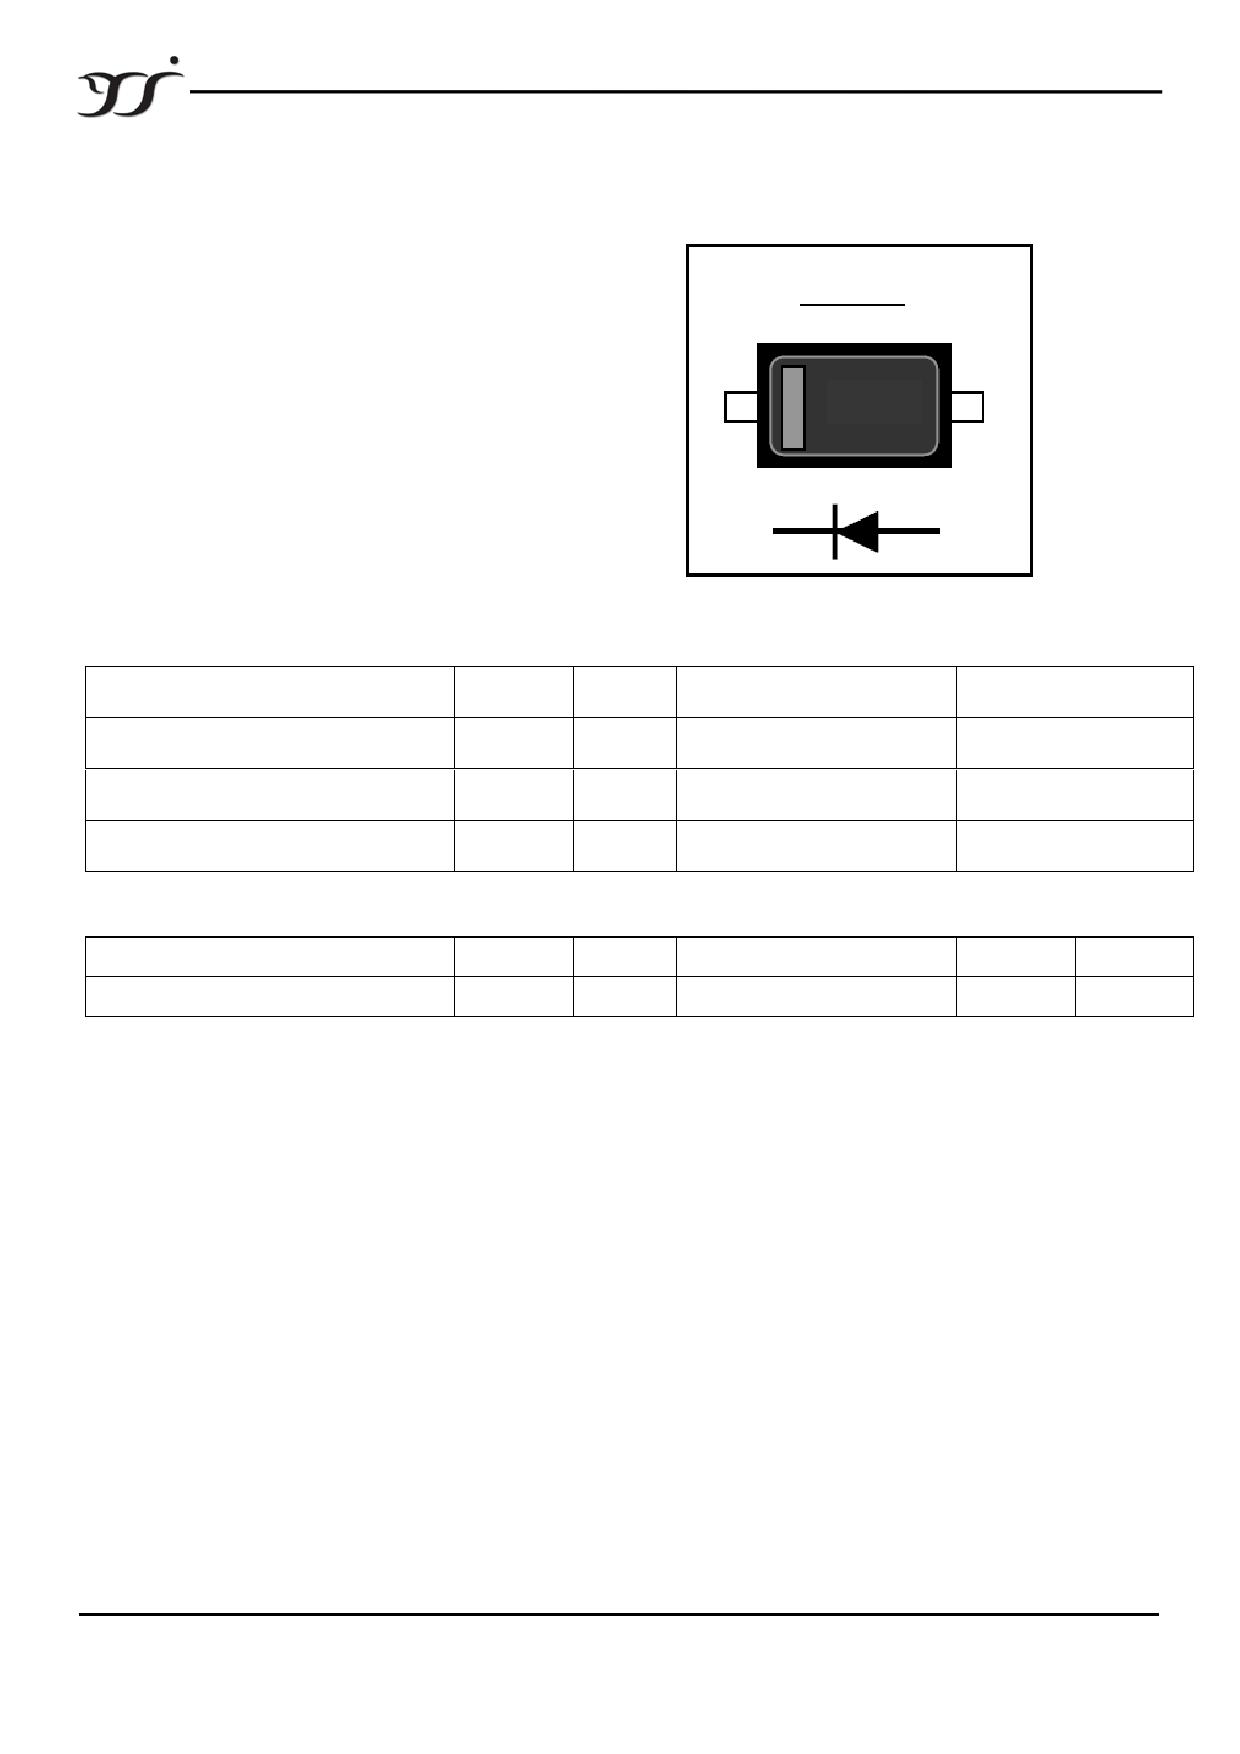 MMSZ5265B Datasheet